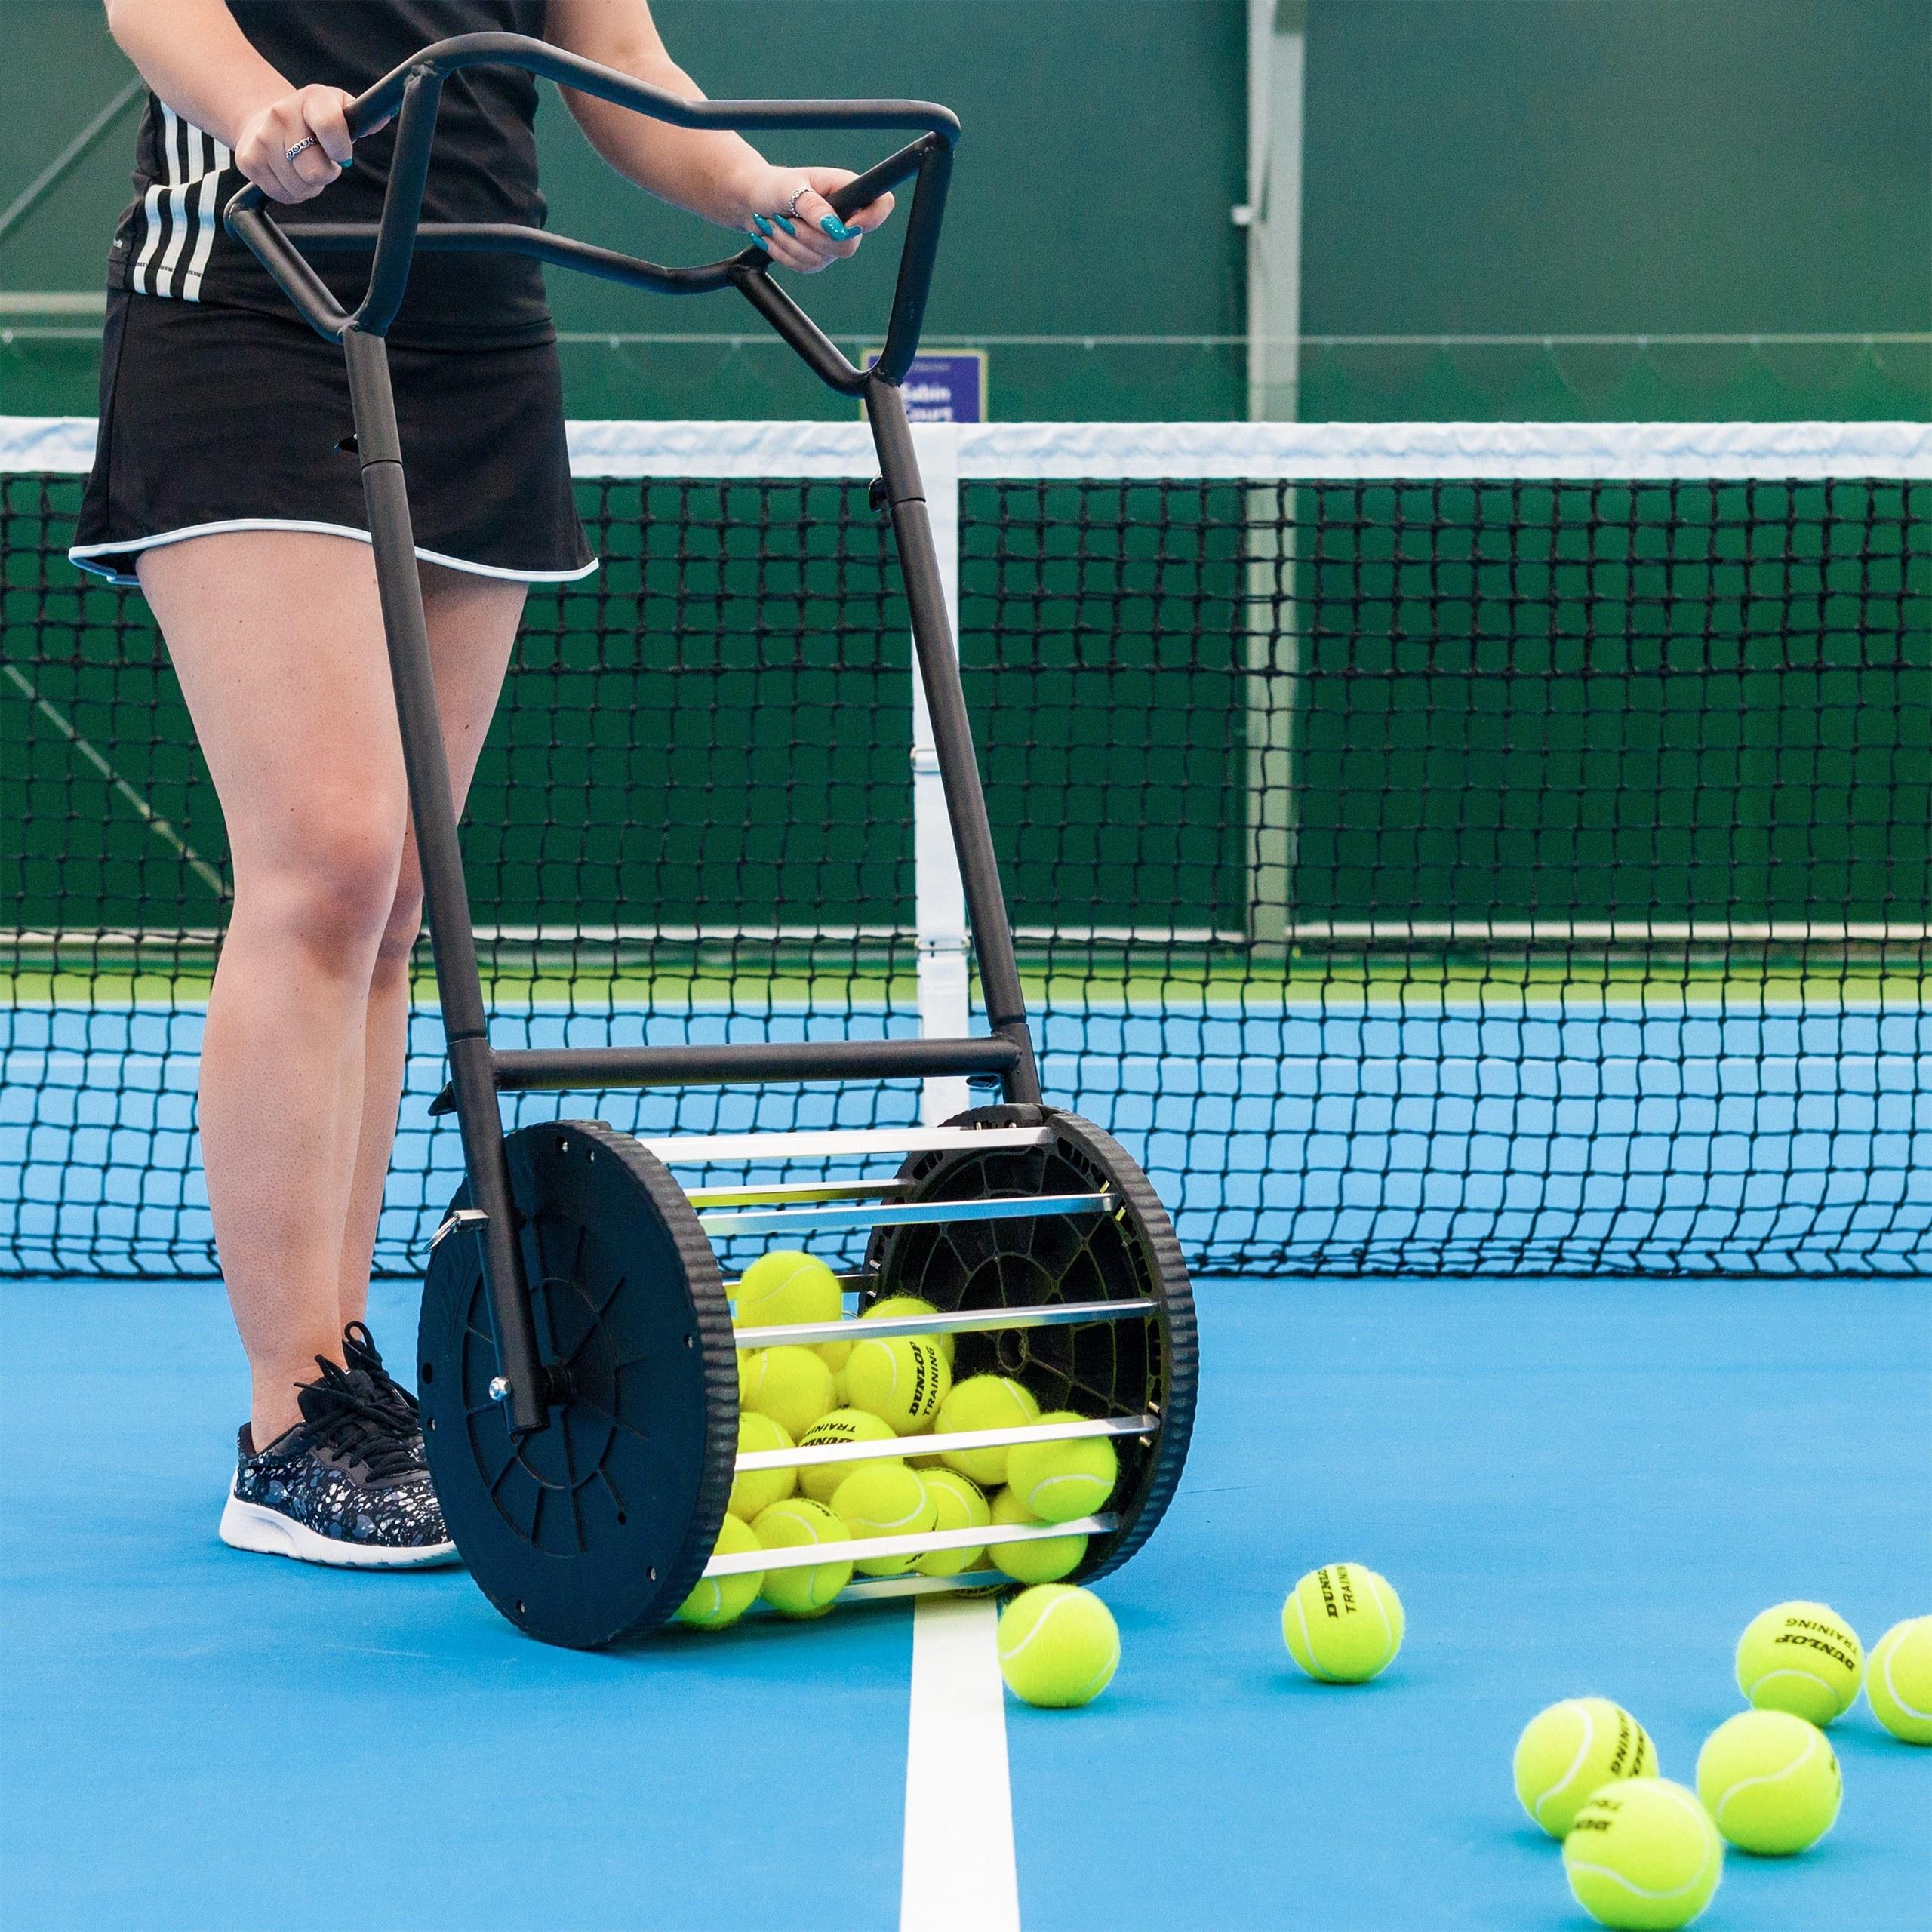 Tennis Ball Roller Mower In Action